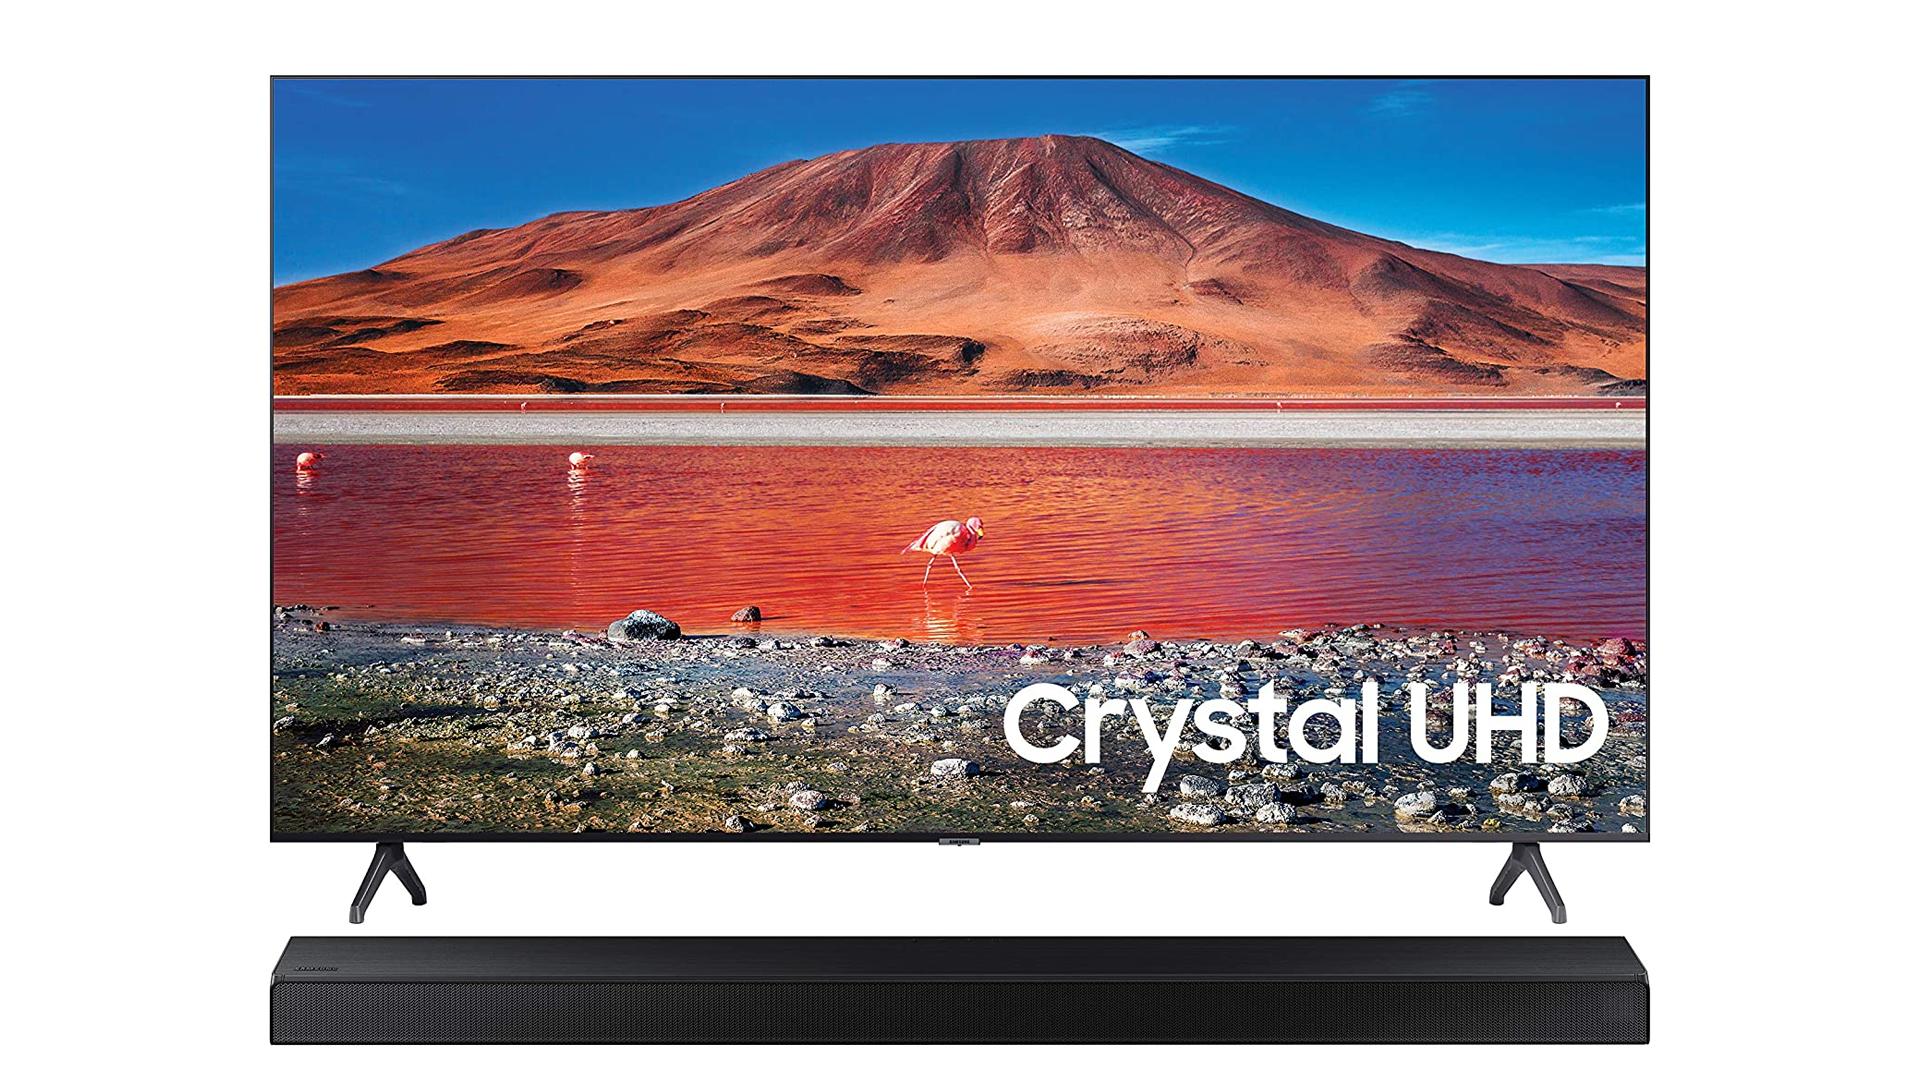 A Samsung TV and soundbar.